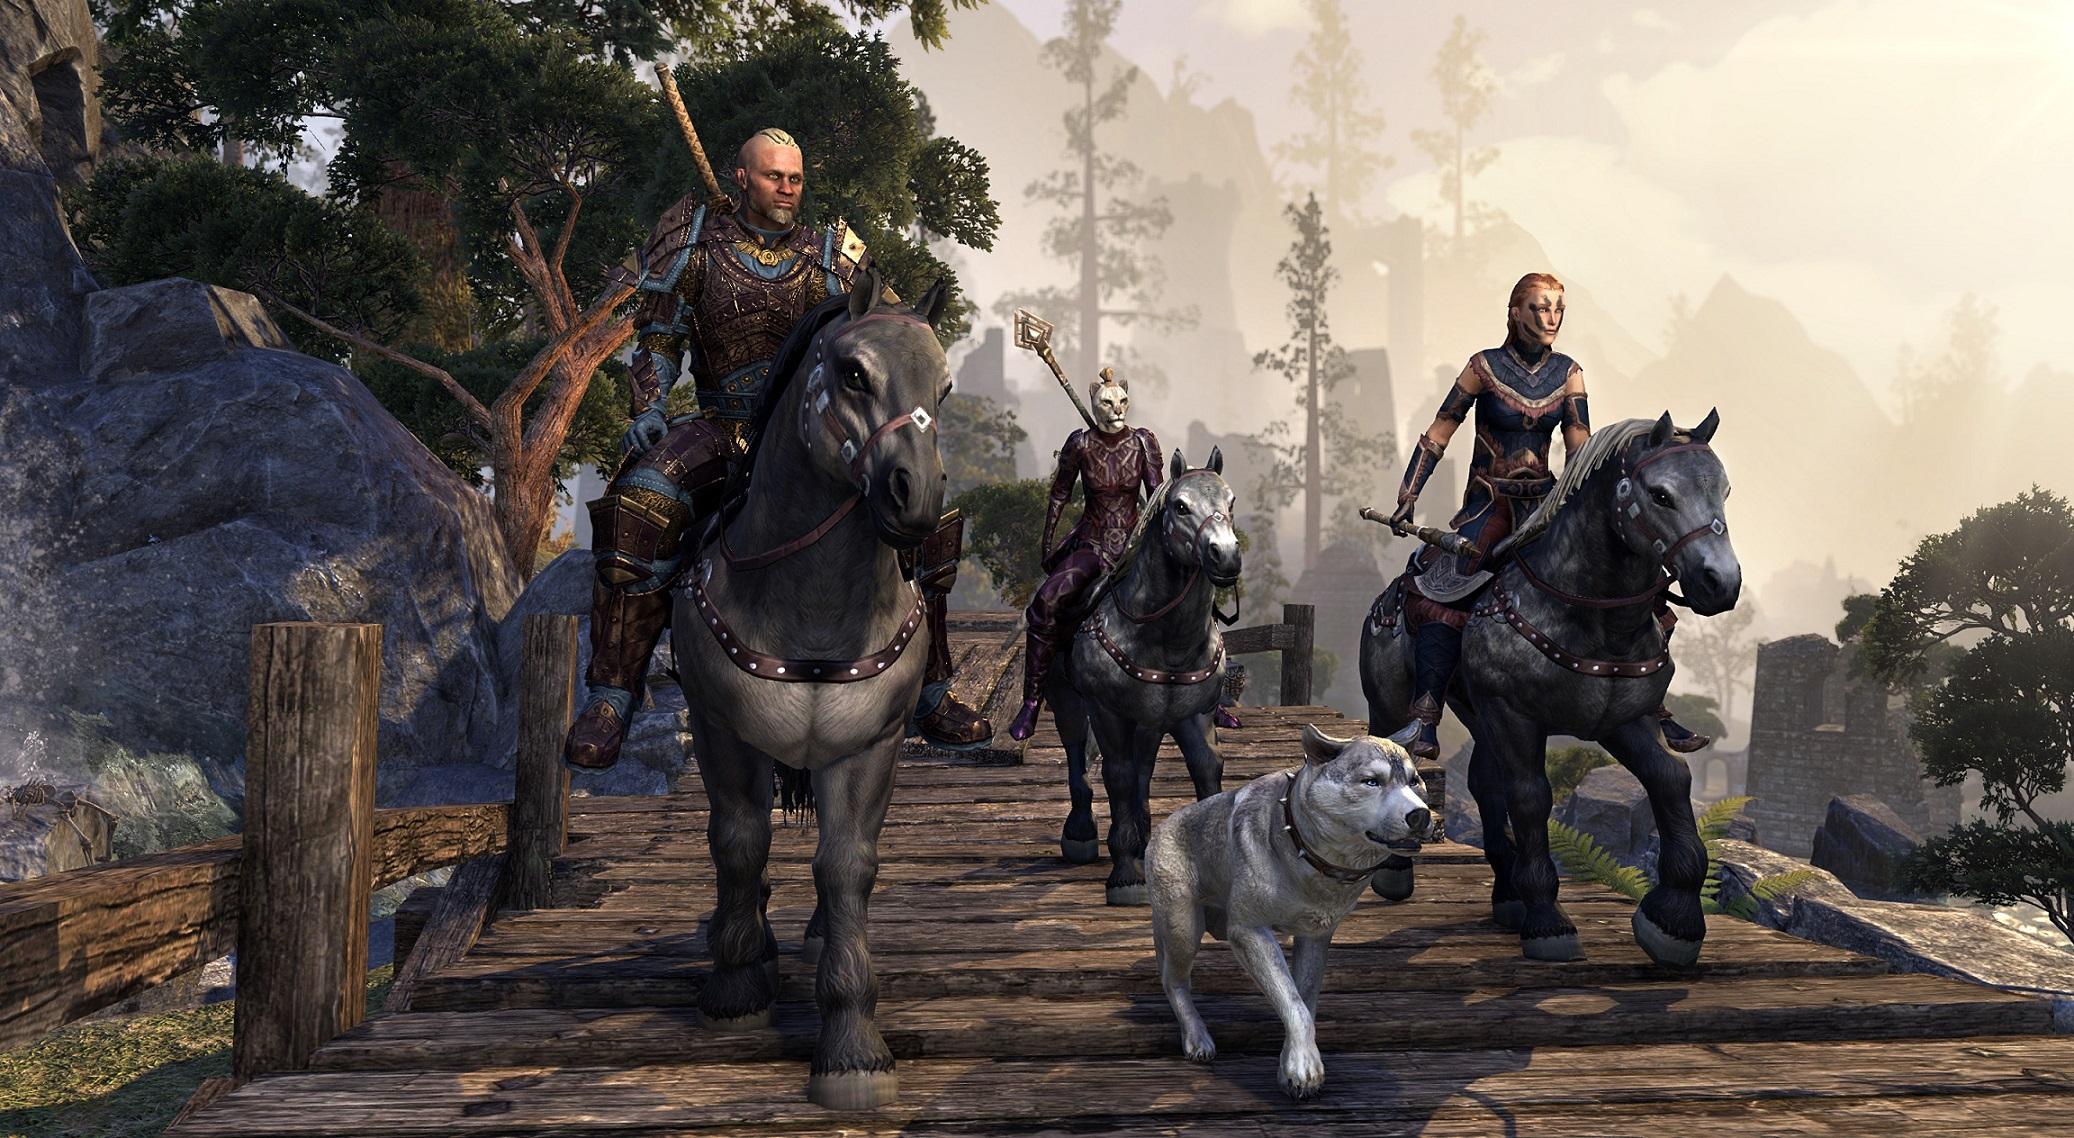 Elder Scrolls Online Tamriel Unlimited Screenshot New Eyes on Wrothgar Horizons